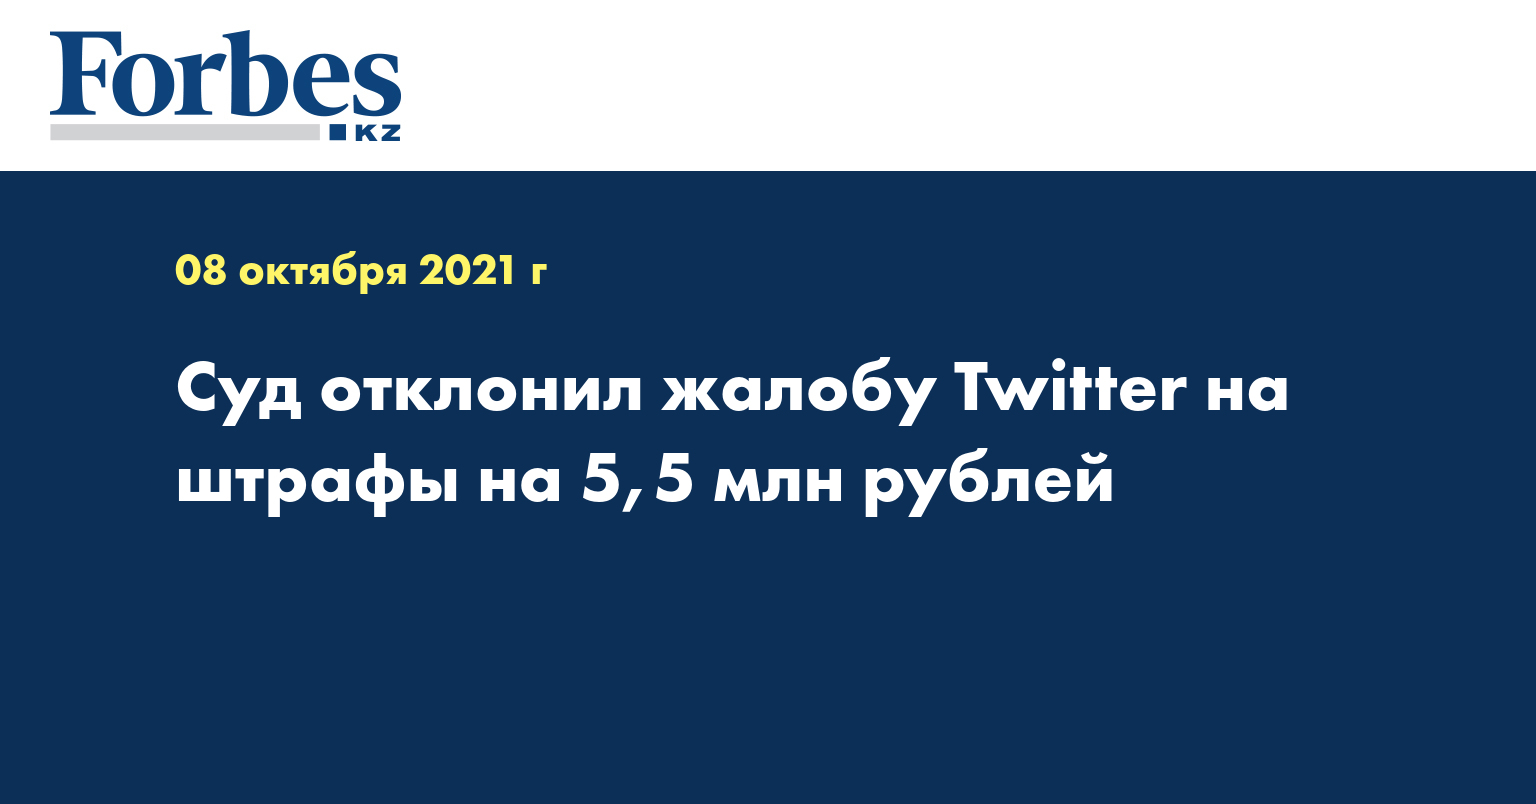 Суд отклонил жалобу Twitter на штрафы на 5,5 млн рублей